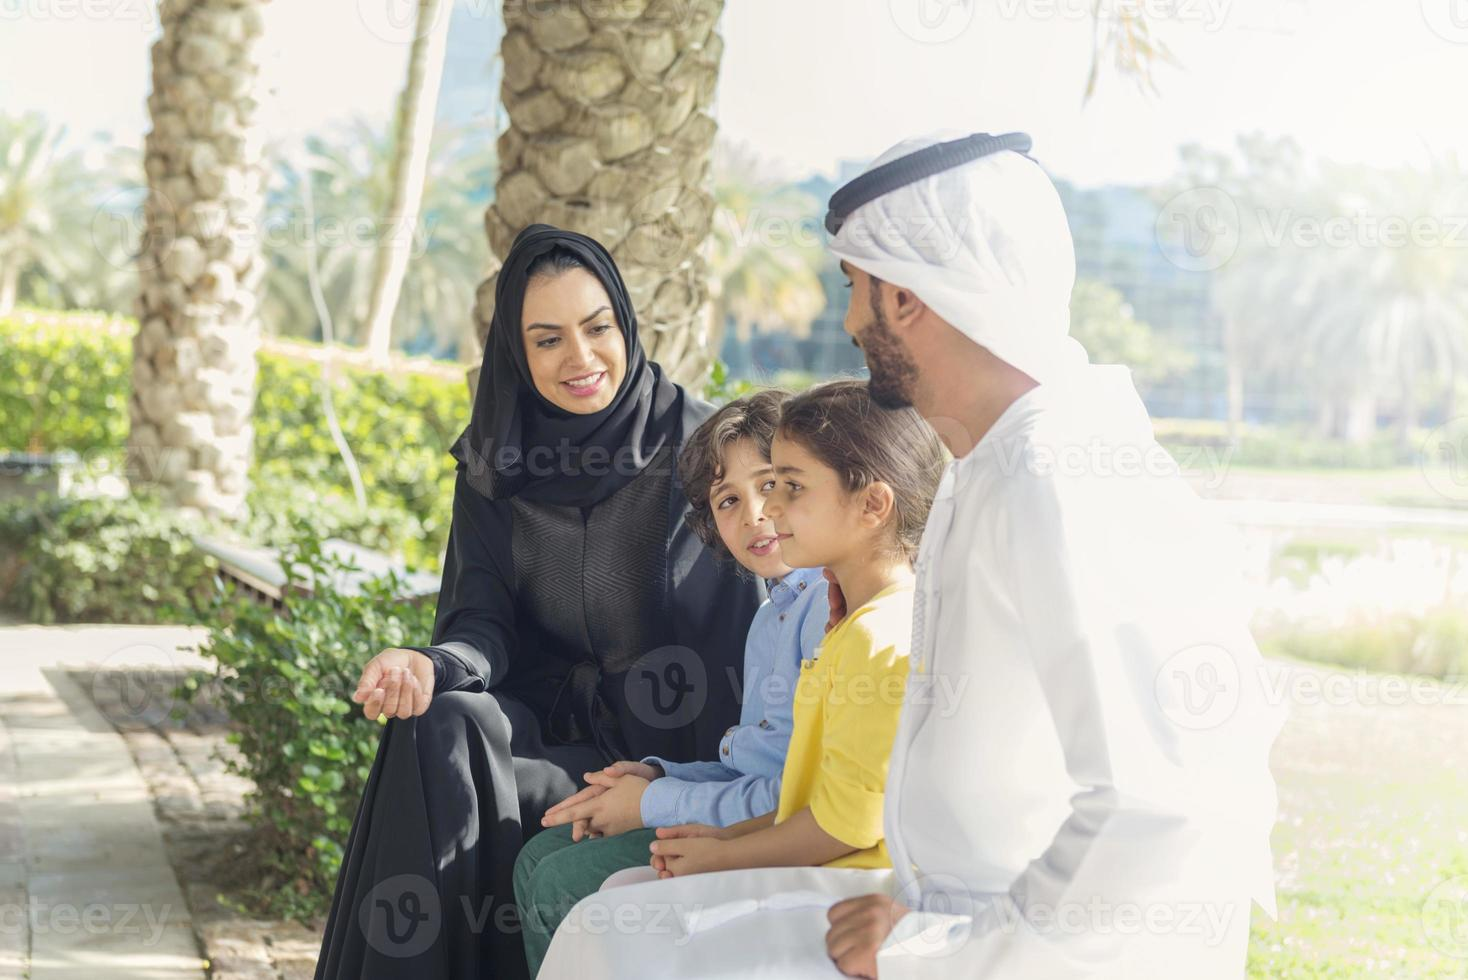 Emirati family in the park photo